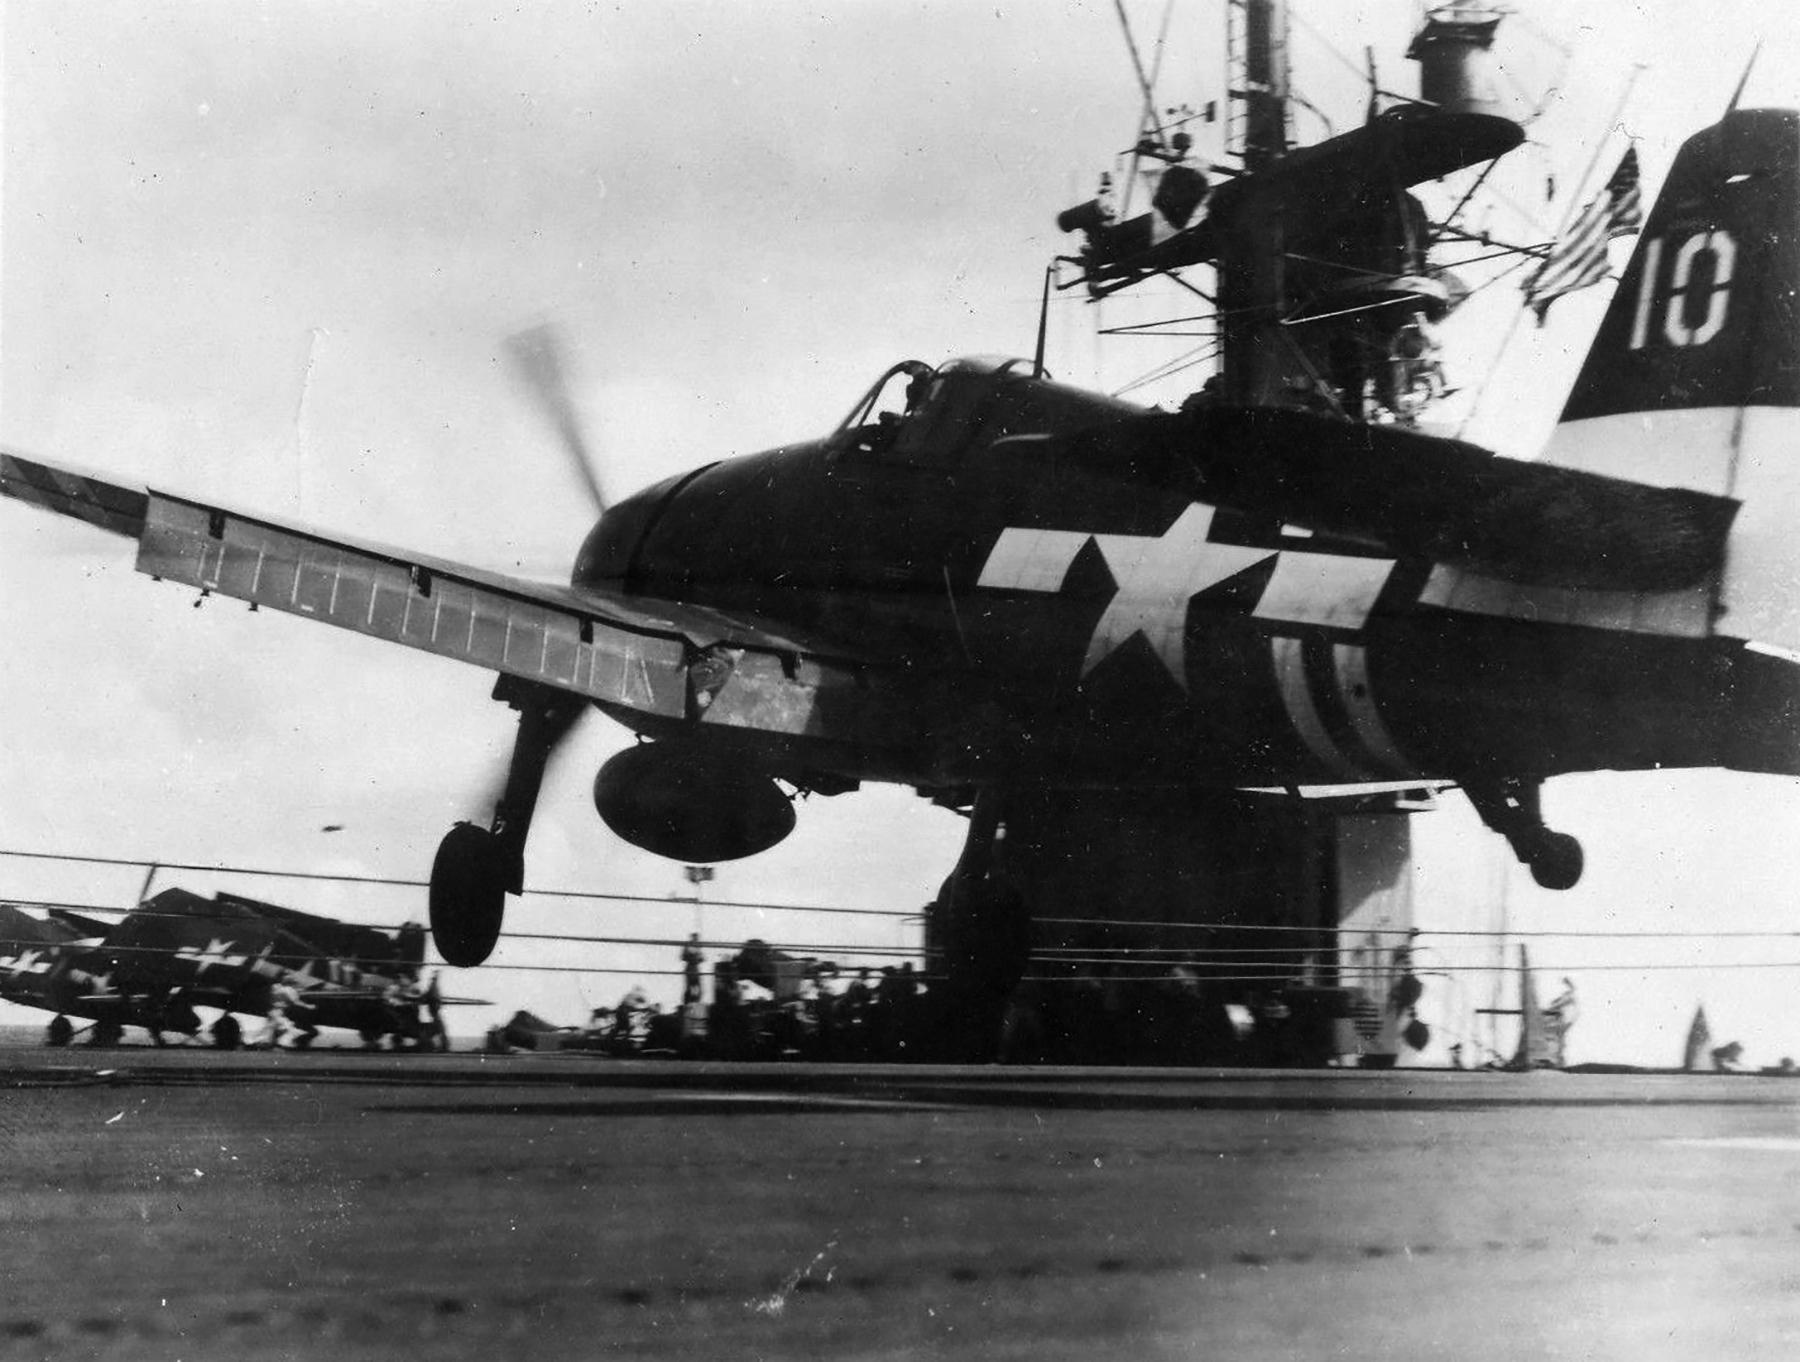 Grumman F6F 5 Hellcat VF 36 White 10 landing mishap CVE 112 USS Siboney Aug 1945 May 1946 01